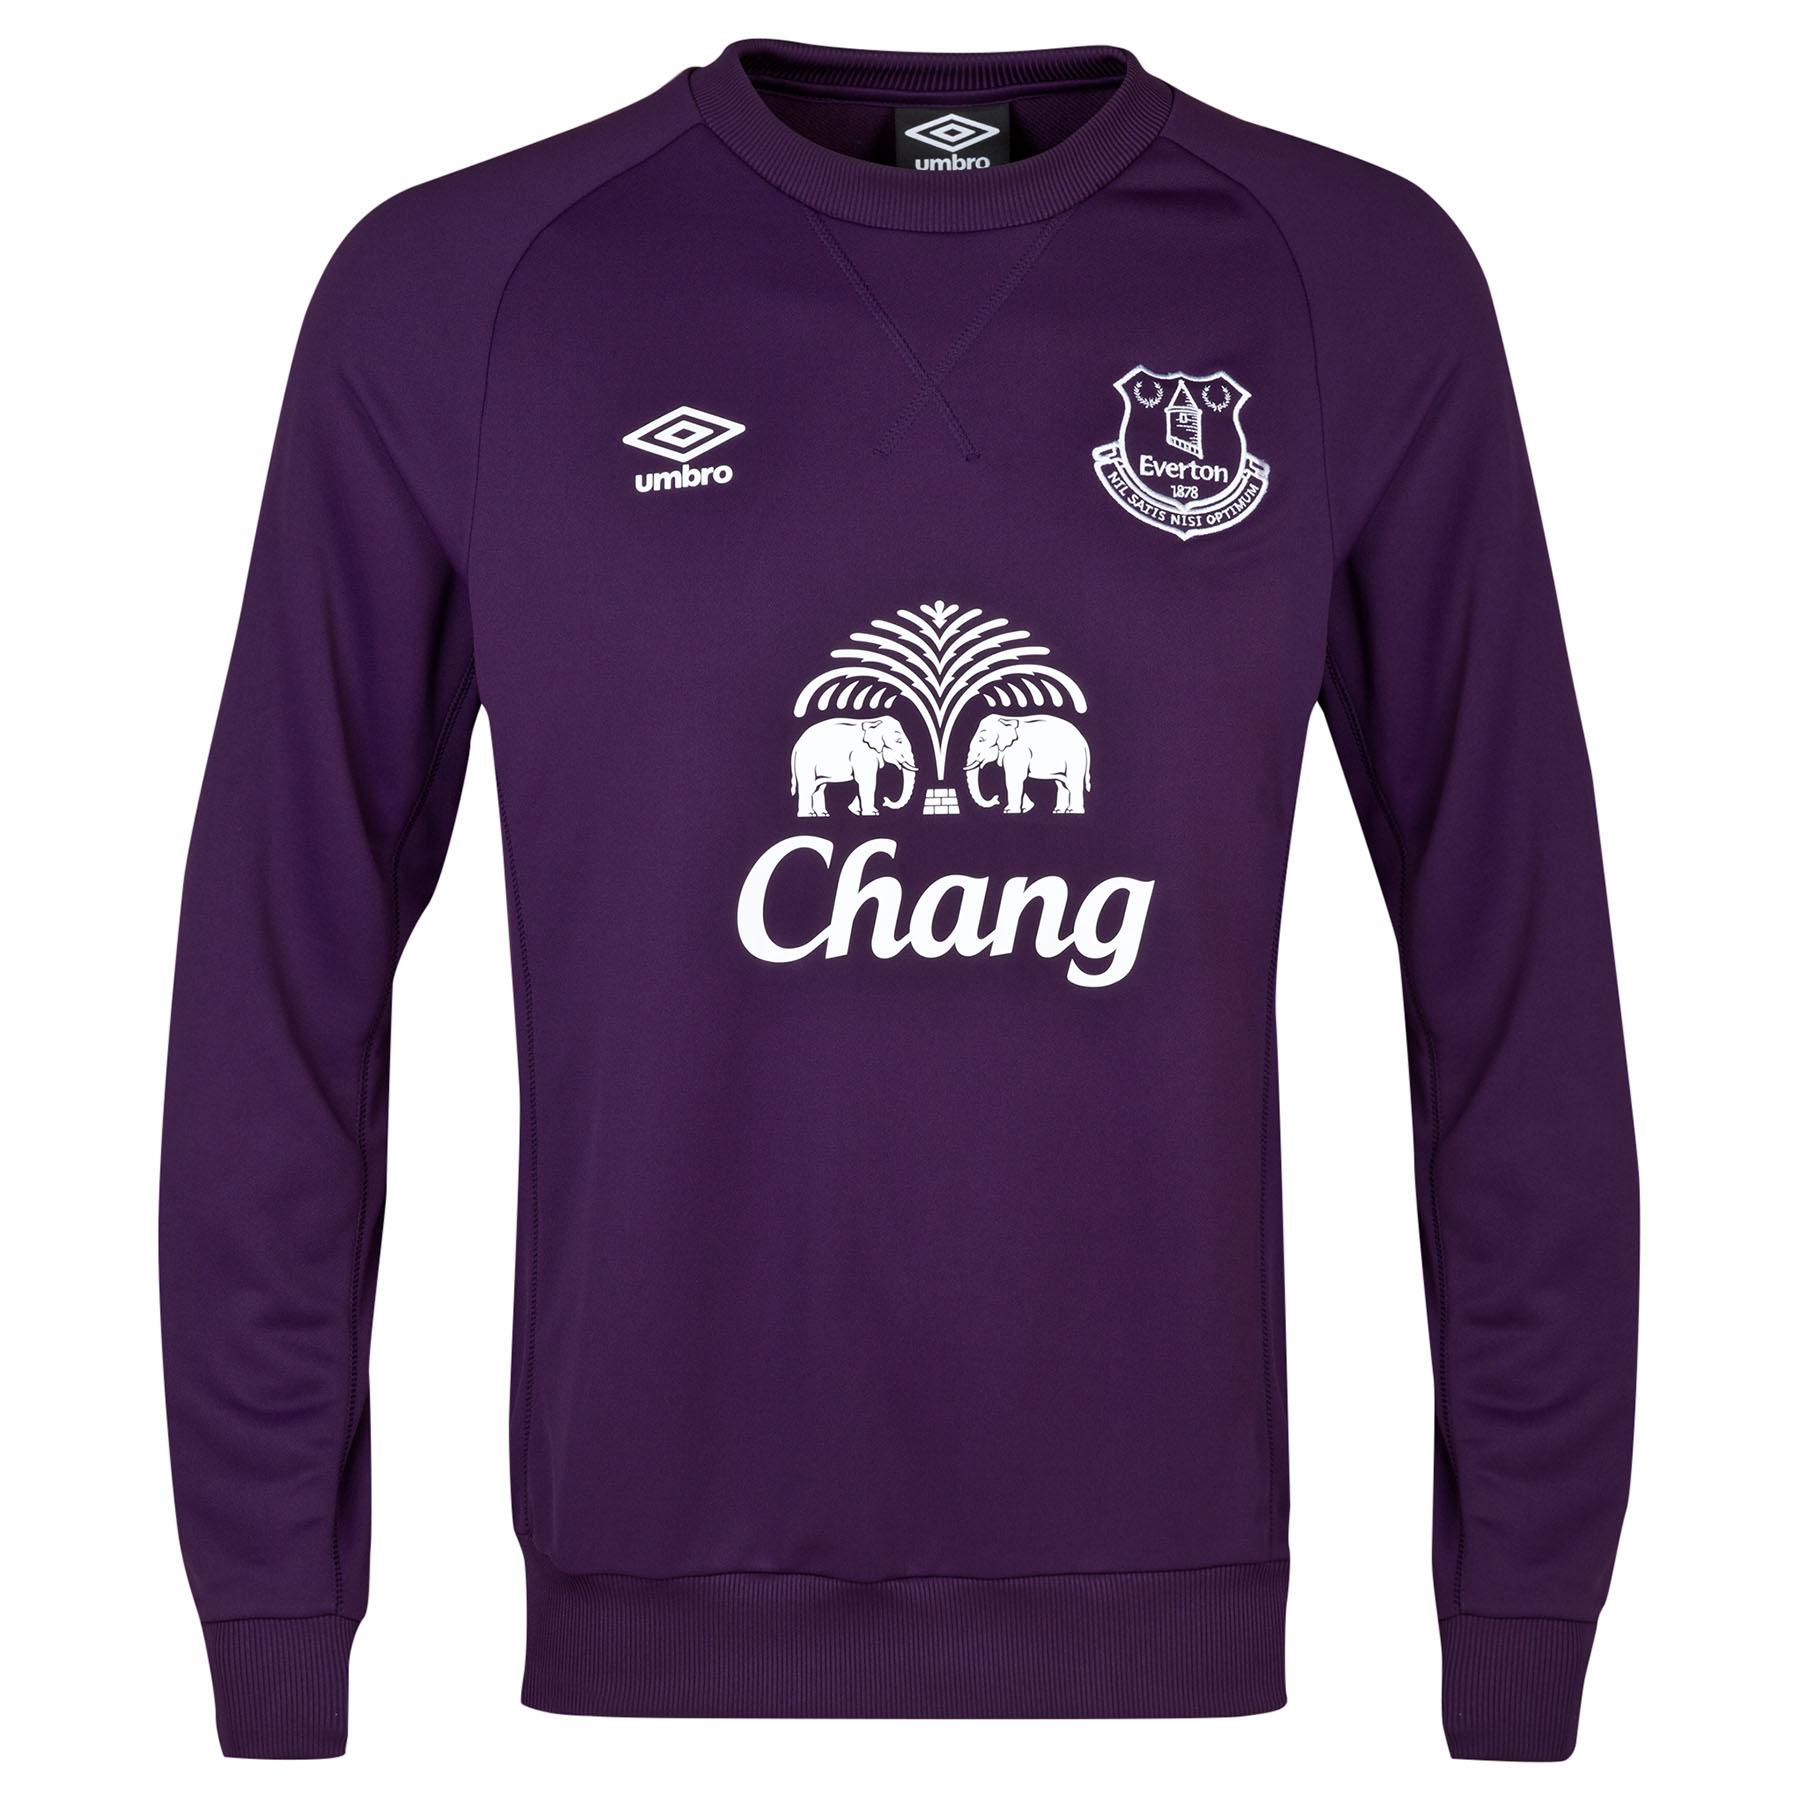 Everton Training Sweat Top-Blackberry Cordial